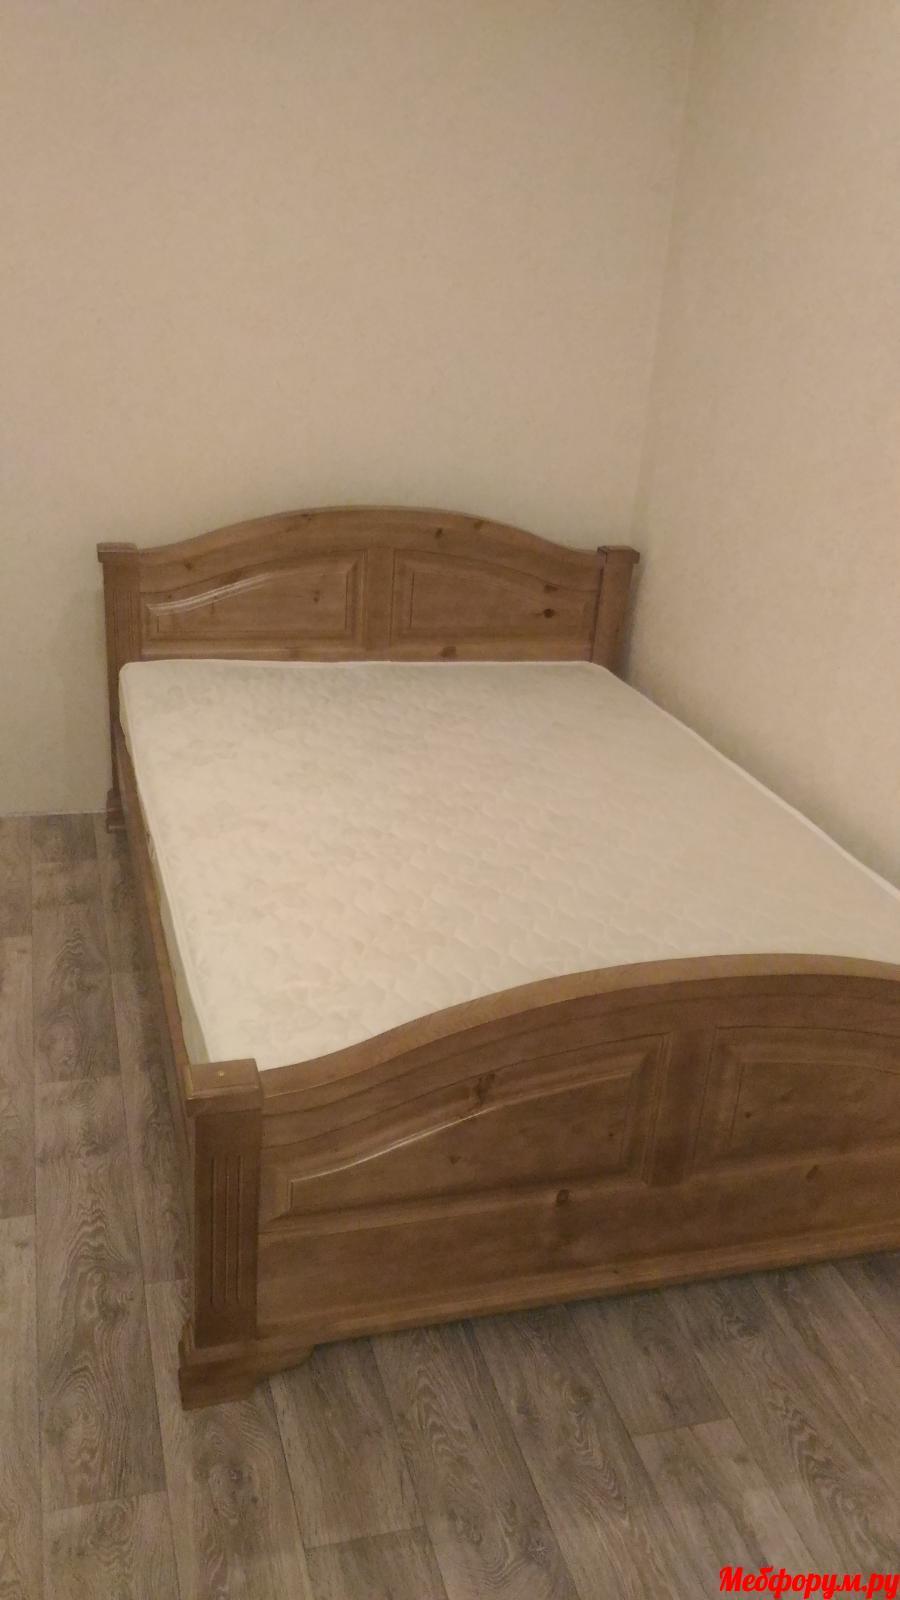 Кровать Акатава4.jpg